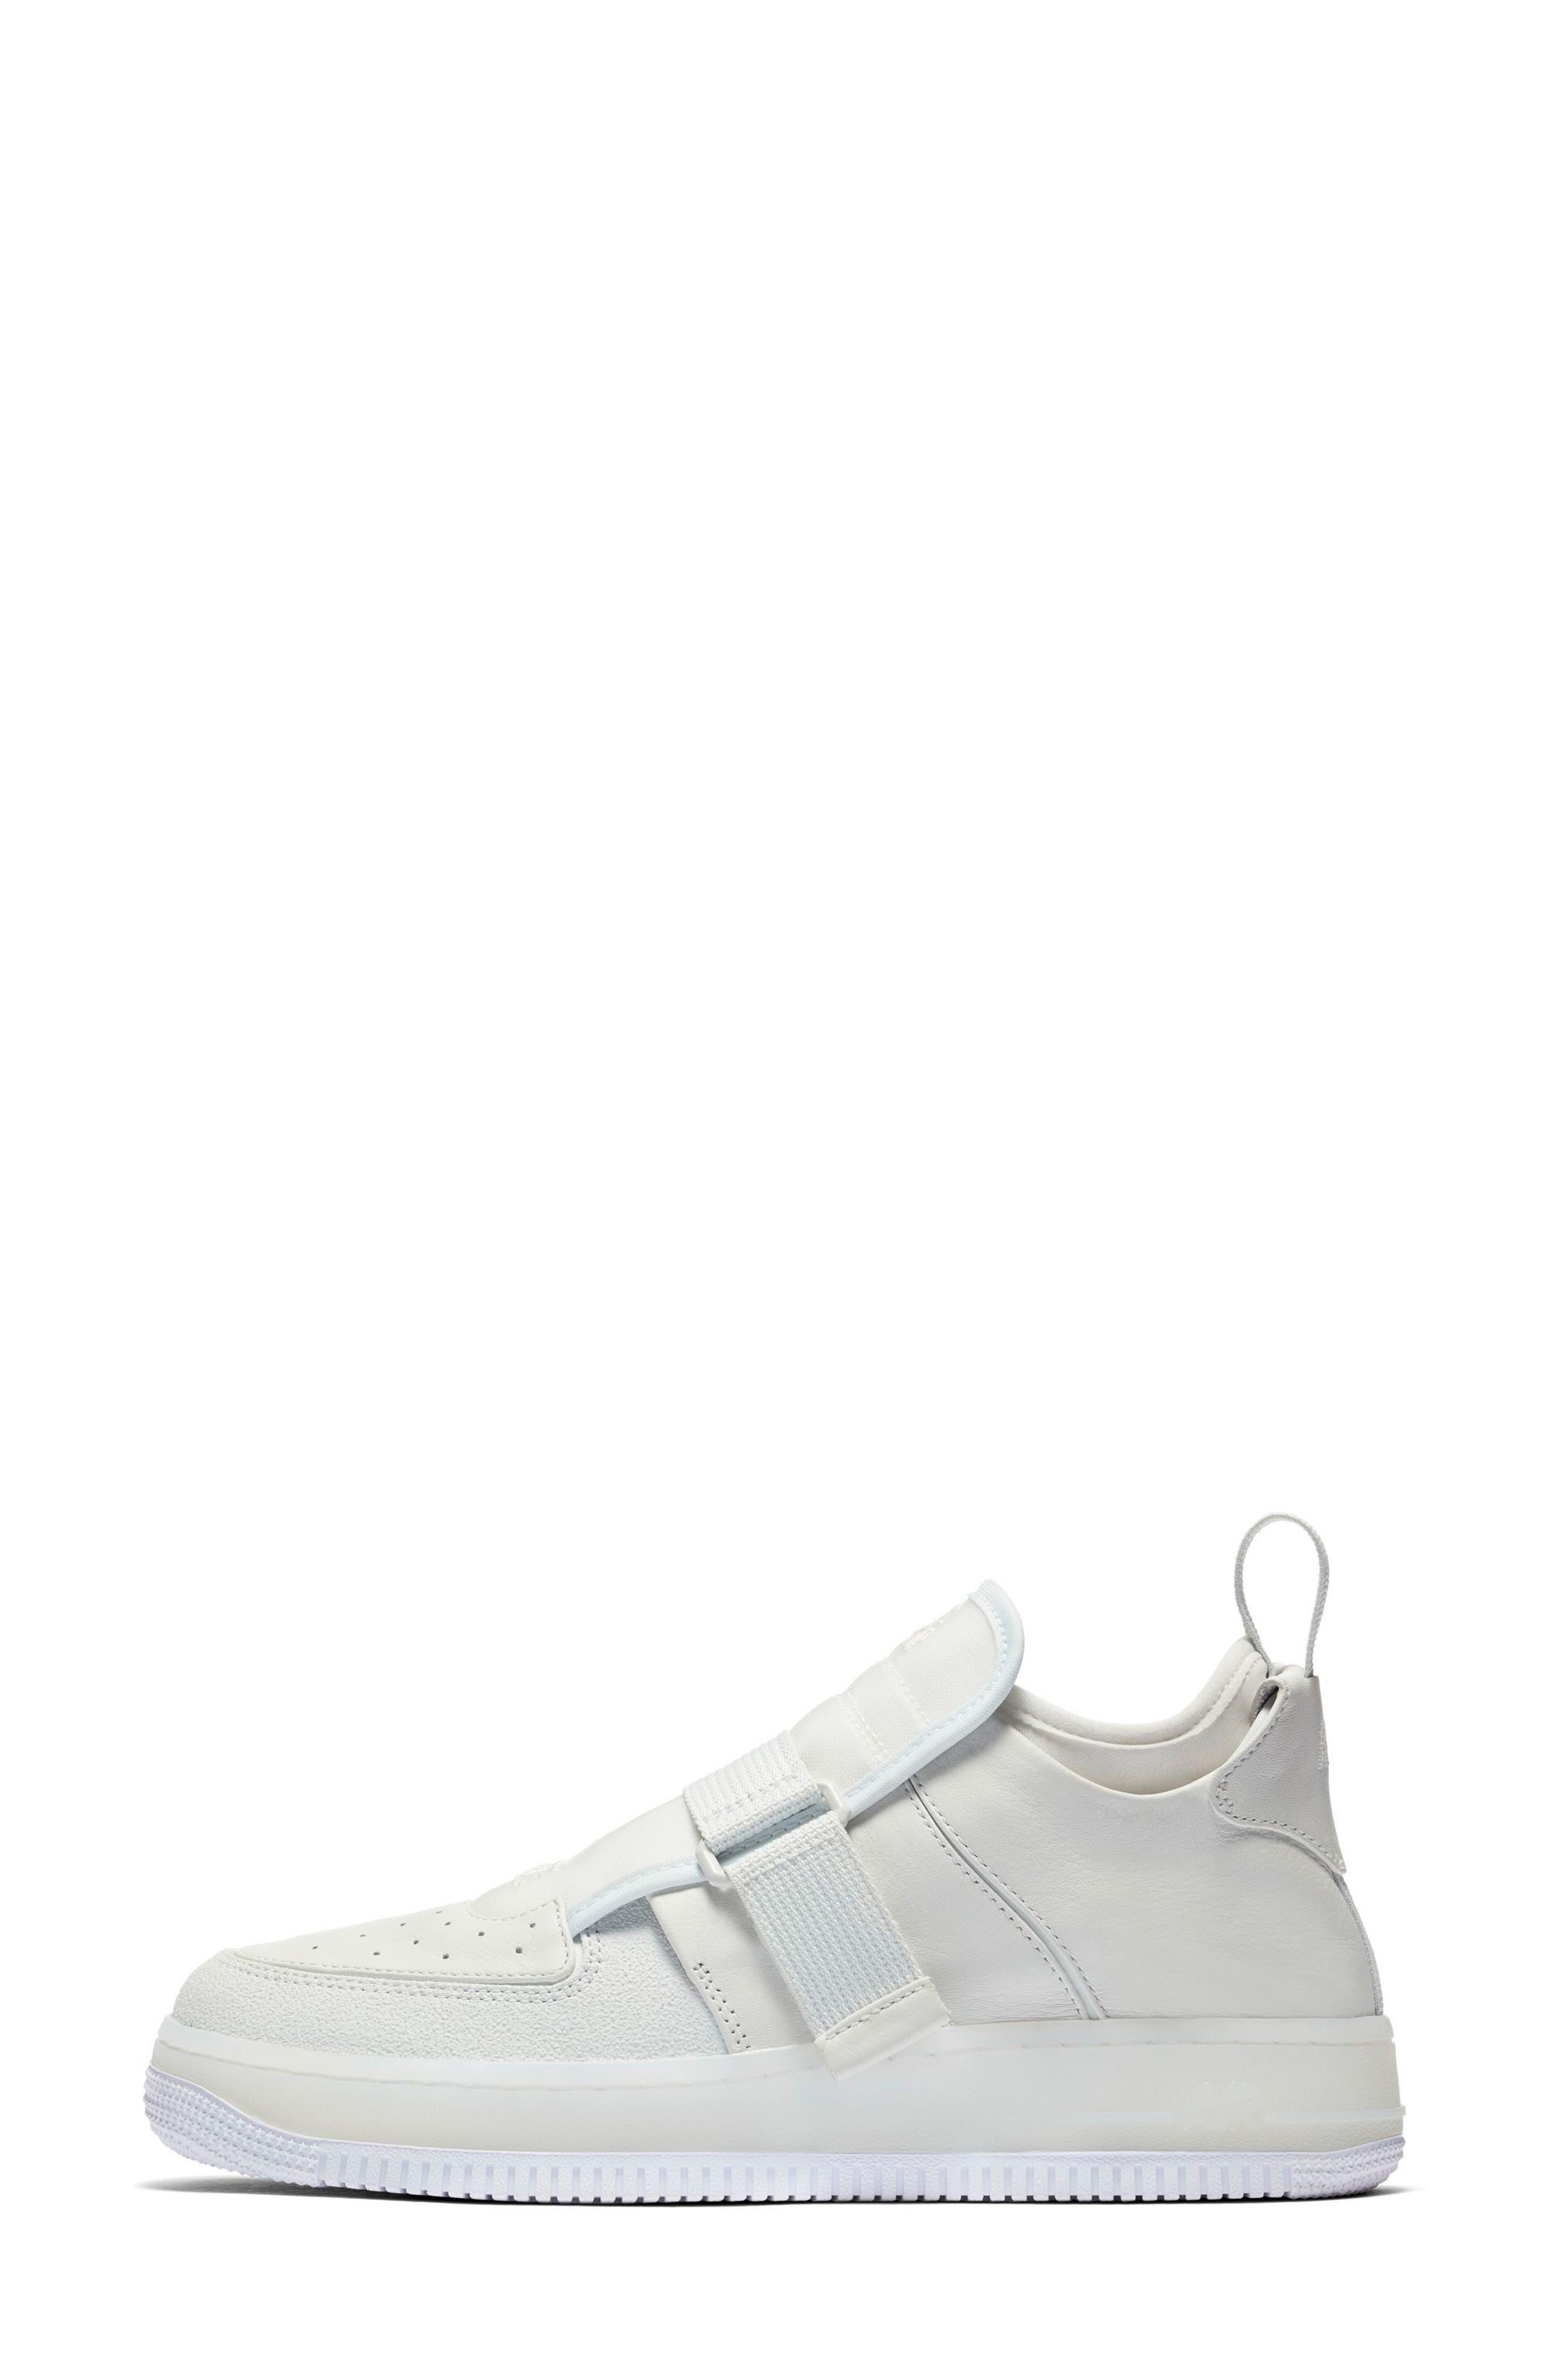 NIKE,                             Air Force 1 Explorer XX Sneaker,                             Alternate thumbnail 3, color,                             100